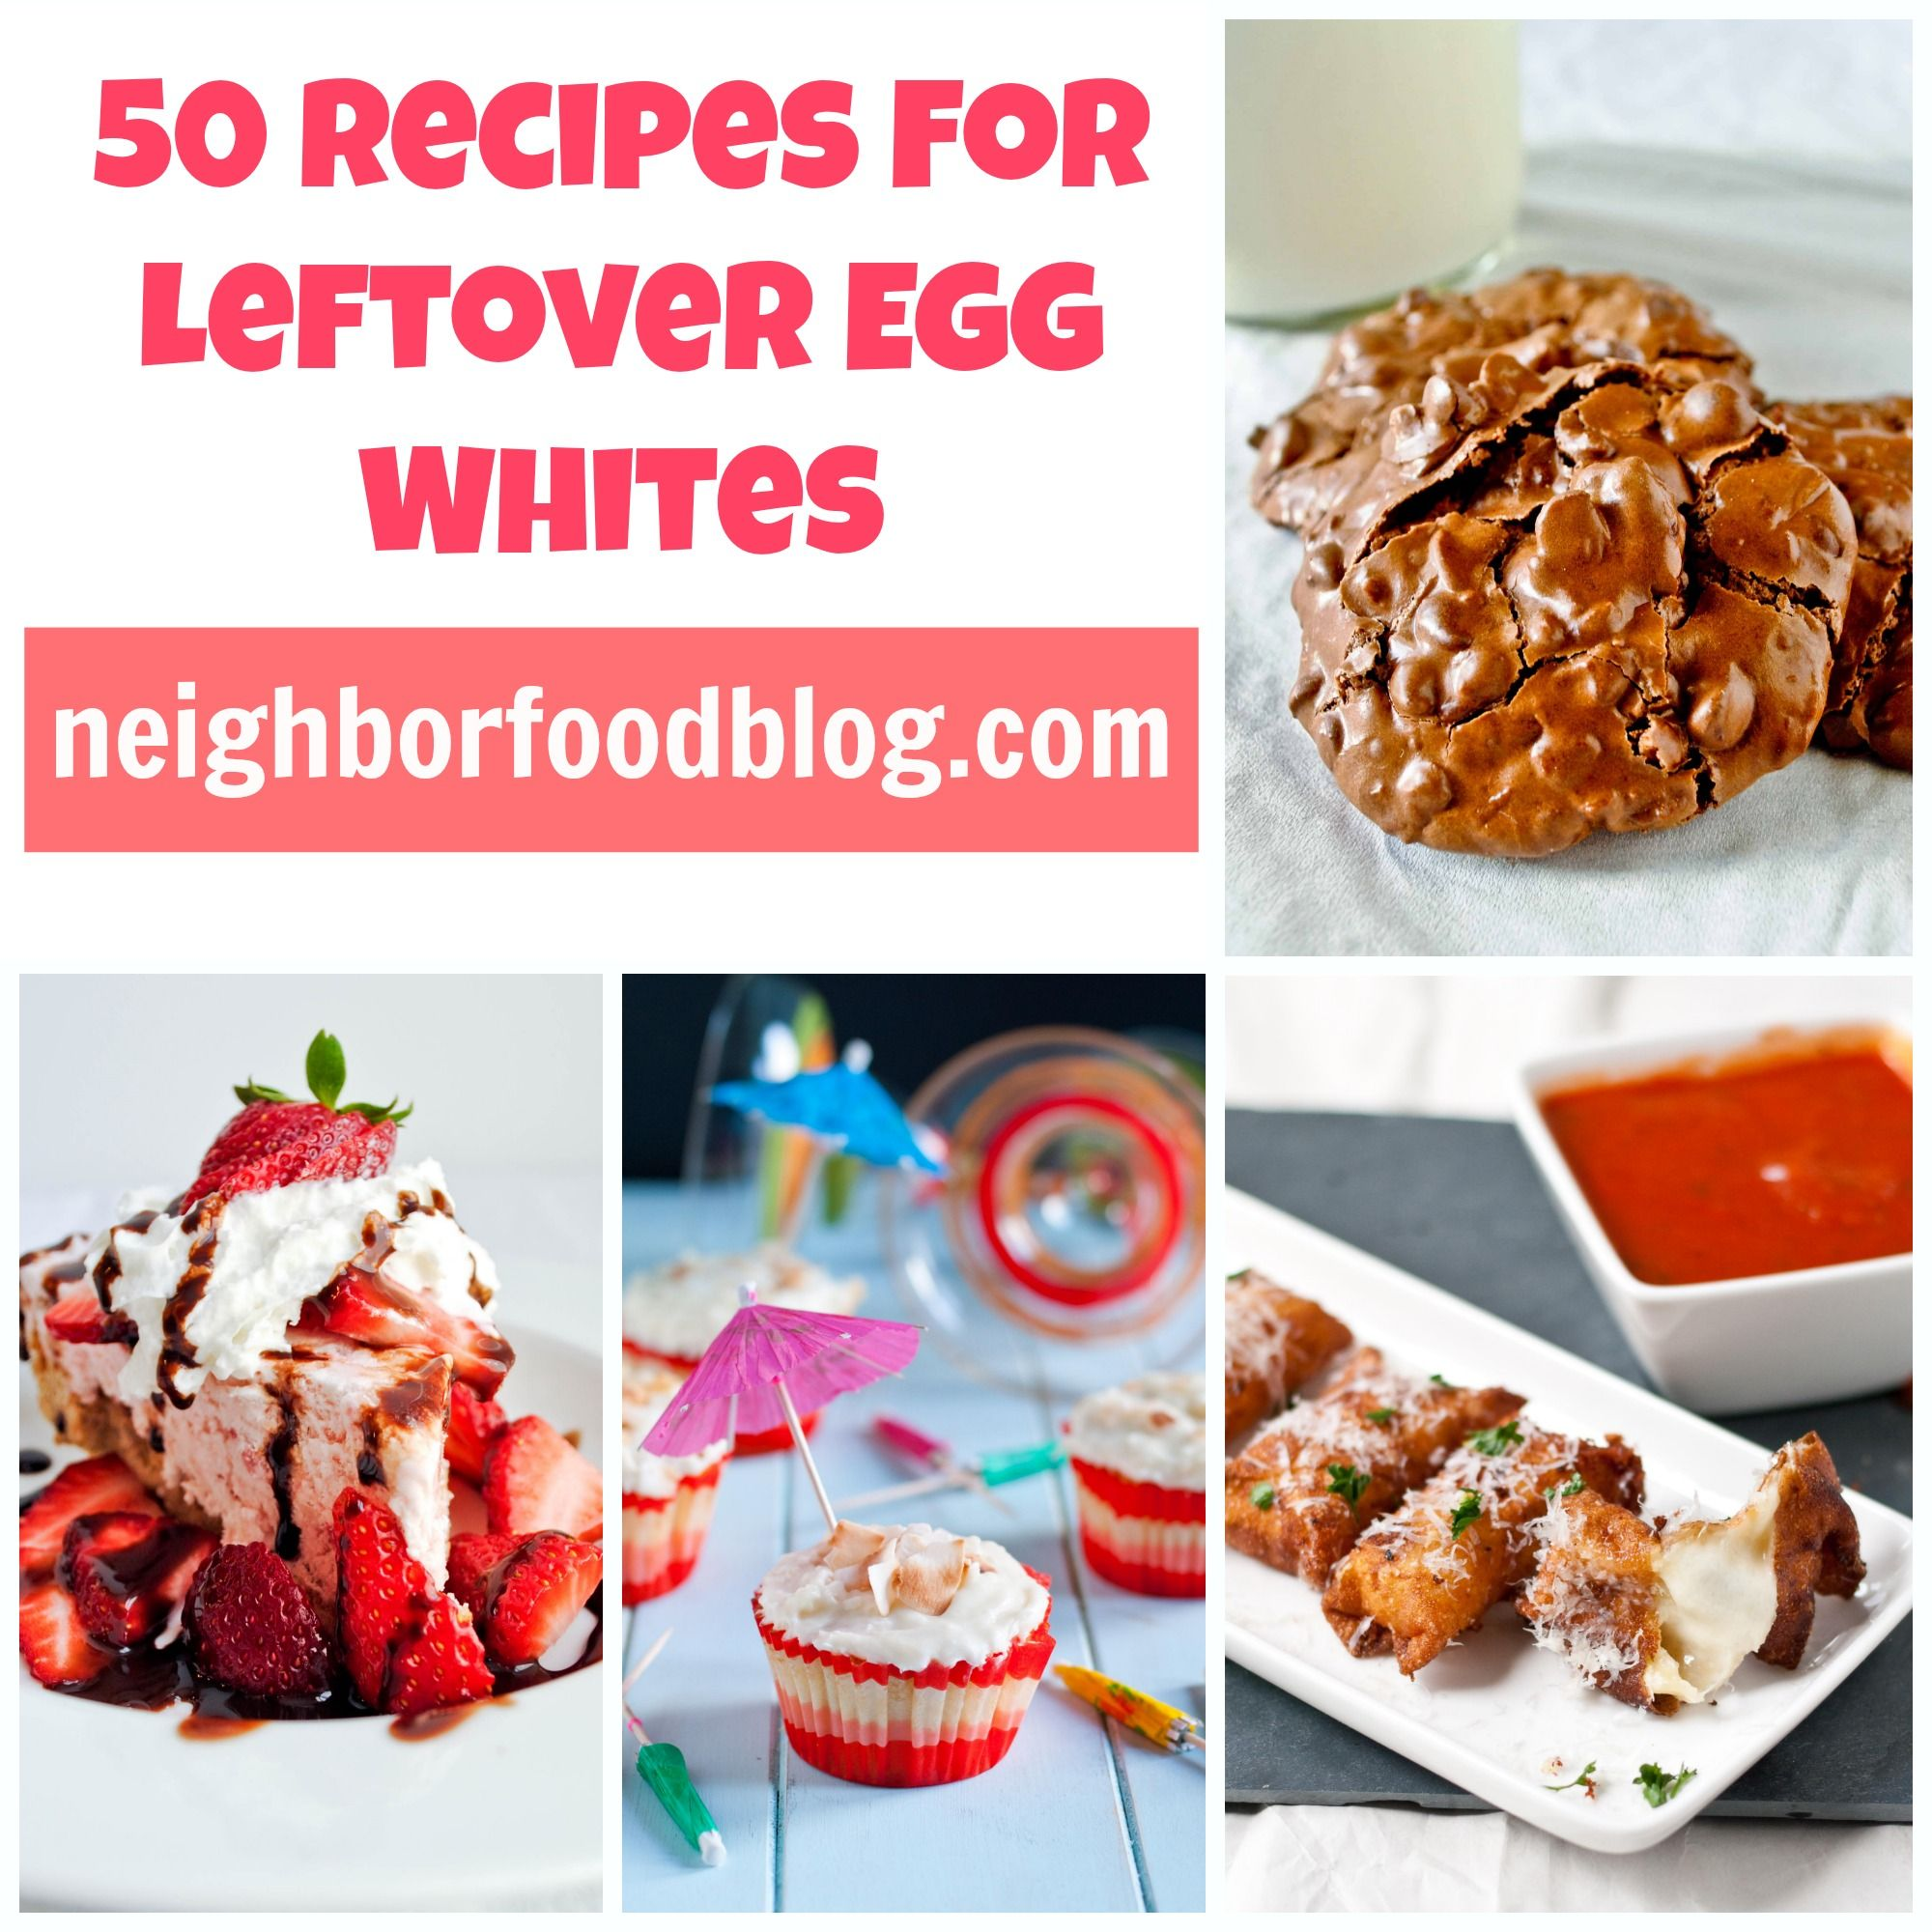 50 Recipes To Use Up Leftover Egg Whites Neighborfood Egg White Recipes Leftover Egg Whites Recipe Using Egg Whites